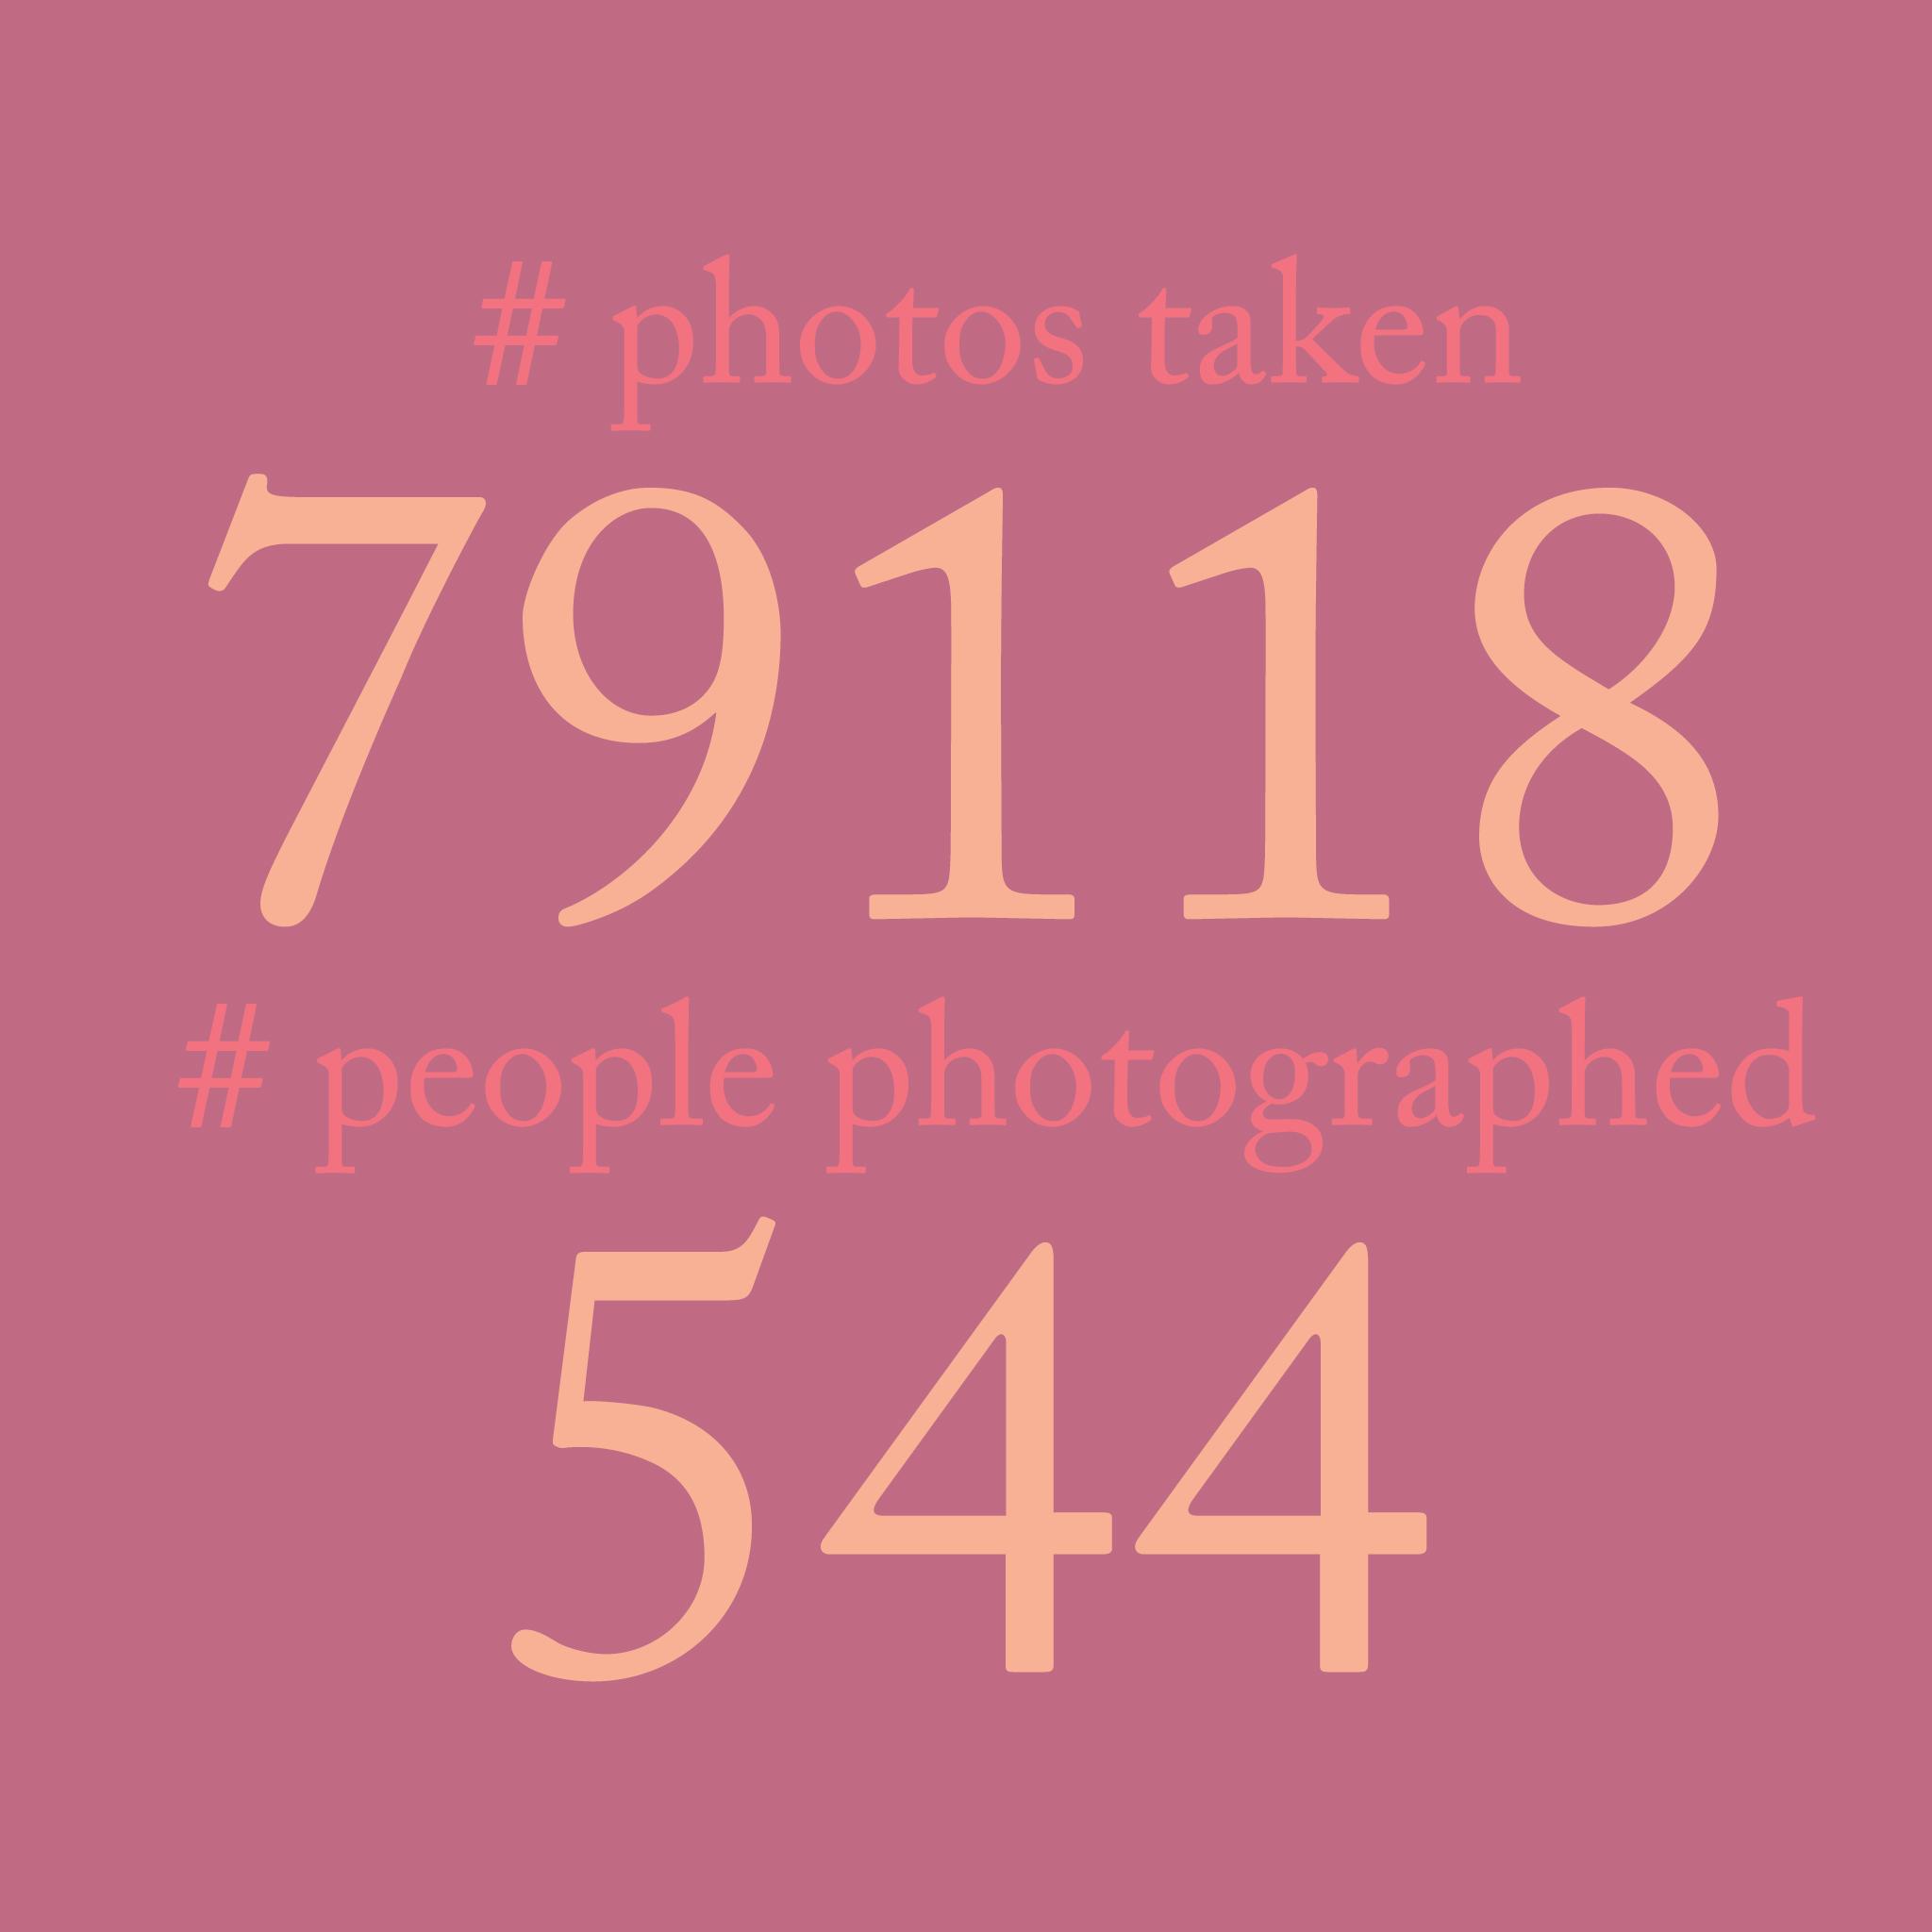 number-of-photos-taken-graphic